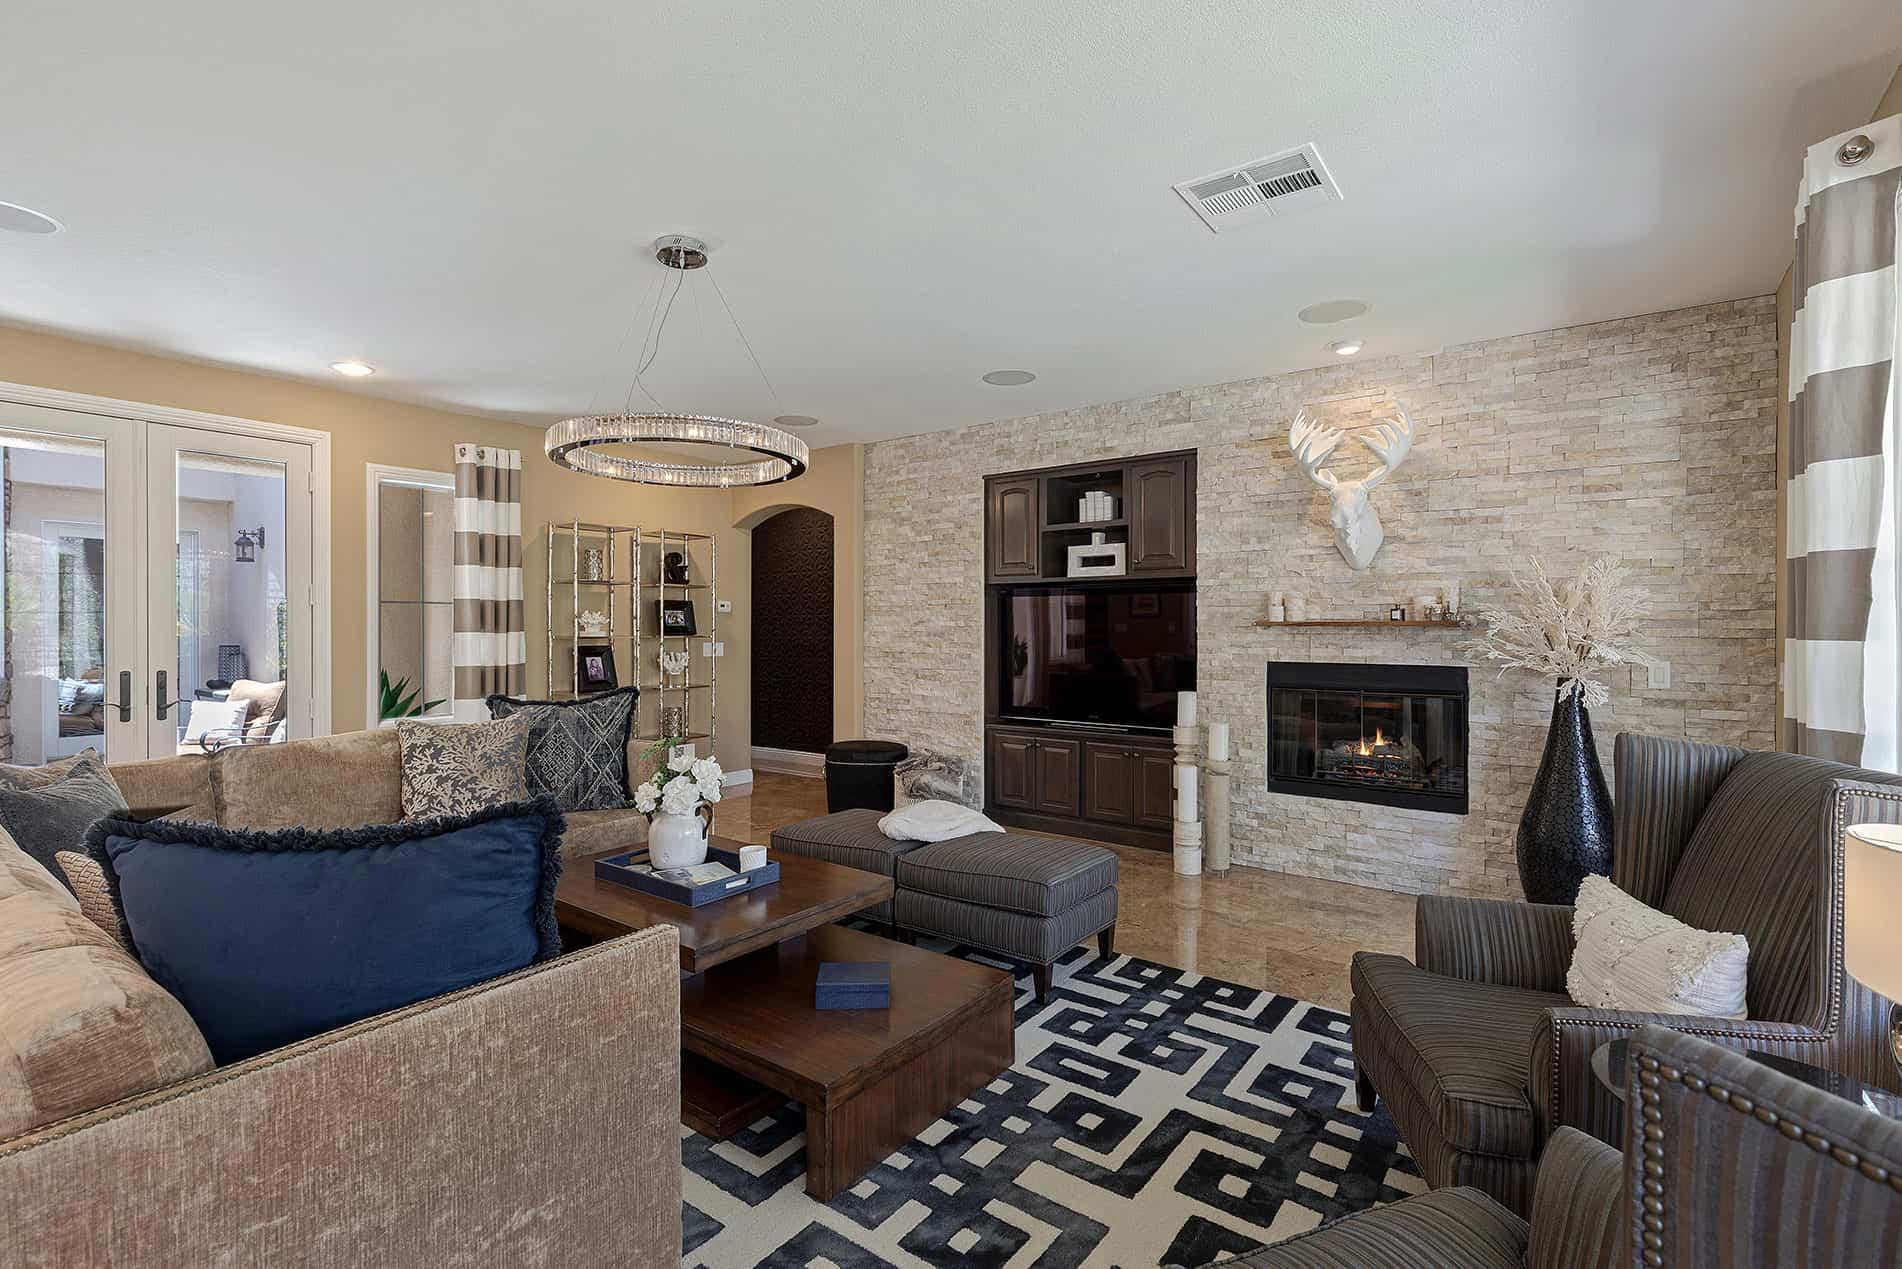 las-vegas-luxry-real-estate-realtor-rob-jensen-company-12108-vista-linda-avenue-the-paseos016